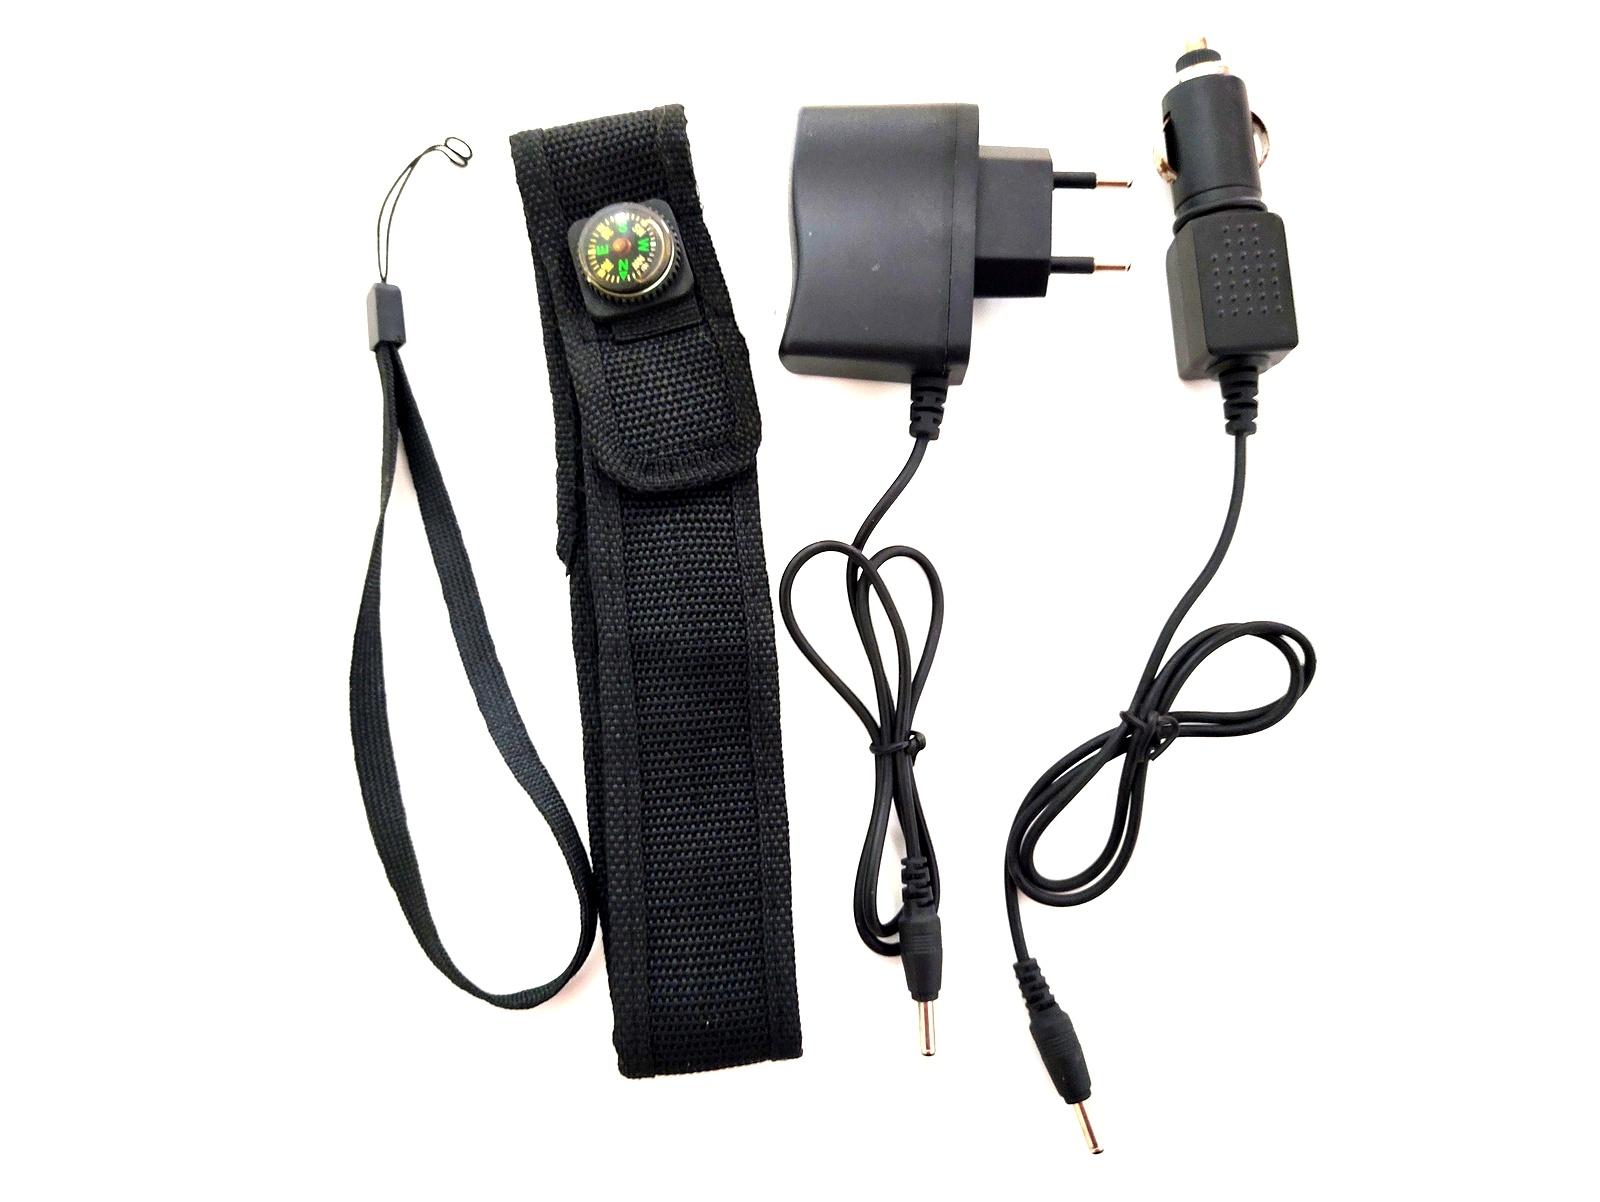 Lanterna Tática Police holofote 12000w 36000l Led T6 Recarregável